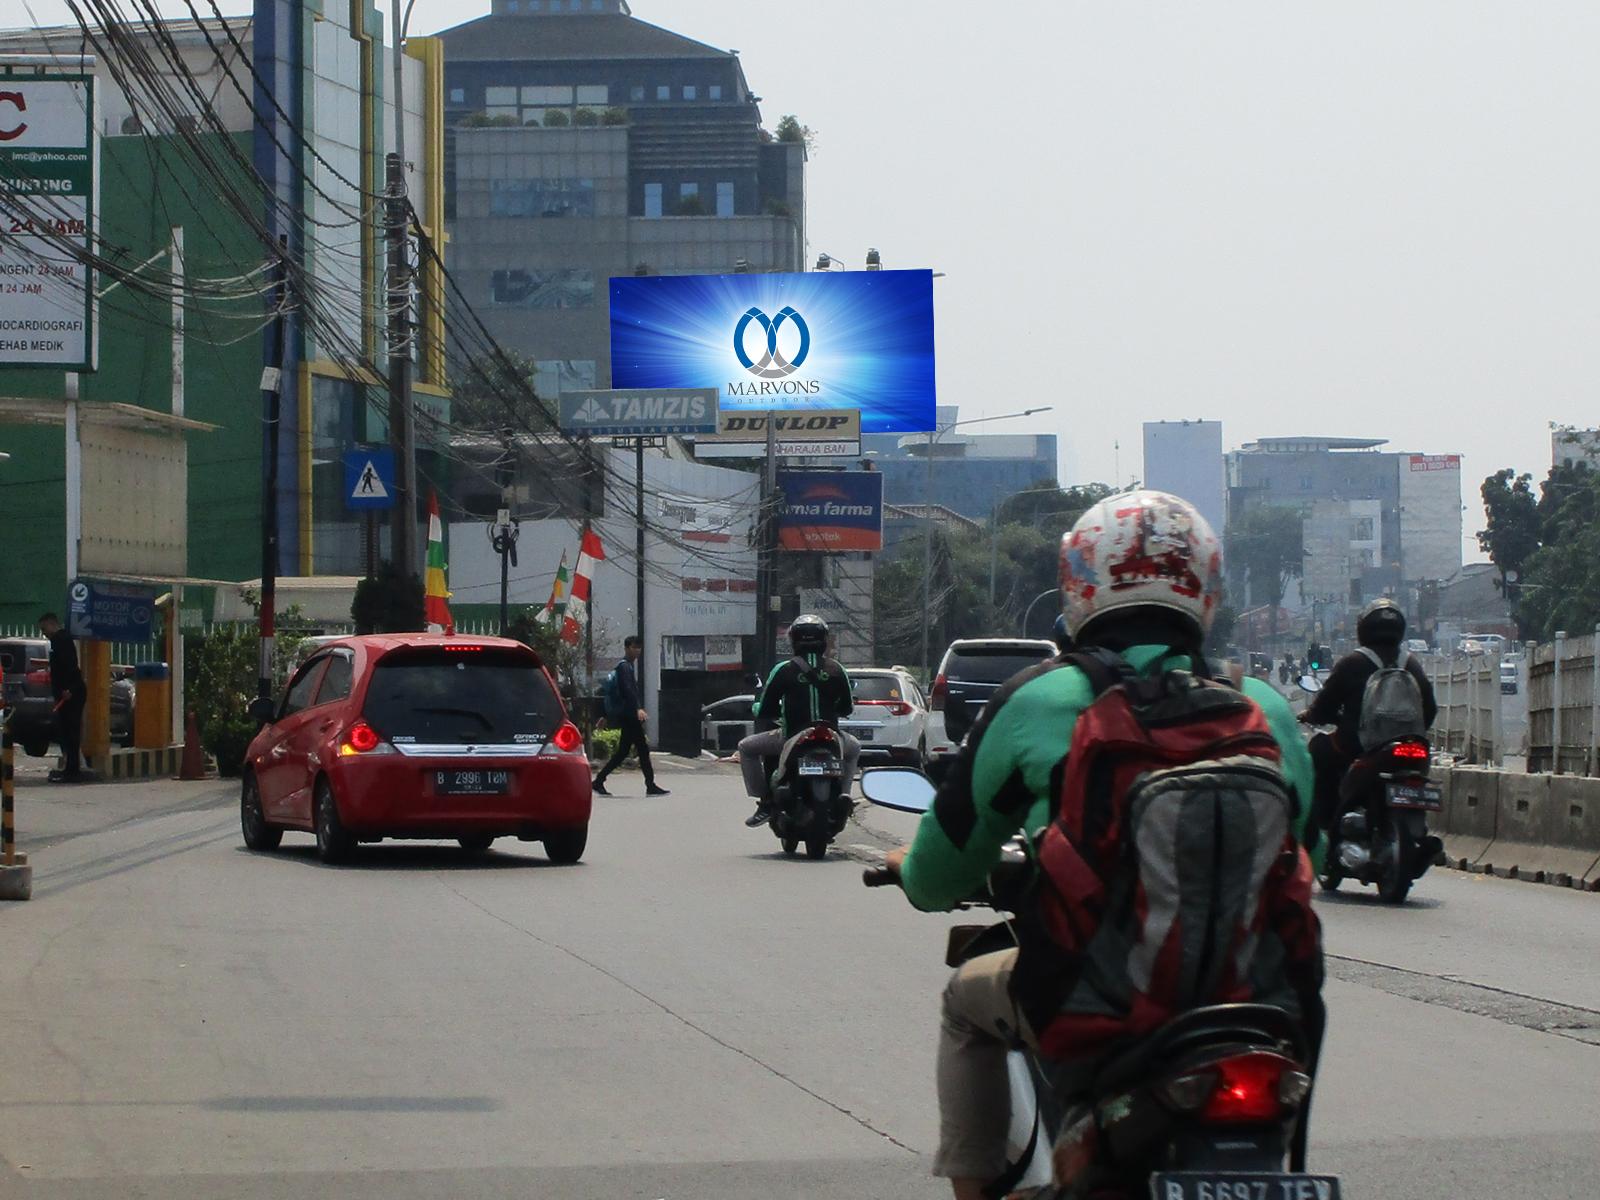 PT. Marvons Media Utama - Warung Buncit (JMC) (MV 008) - 5 m x 10 m x 2 mk Horizontal